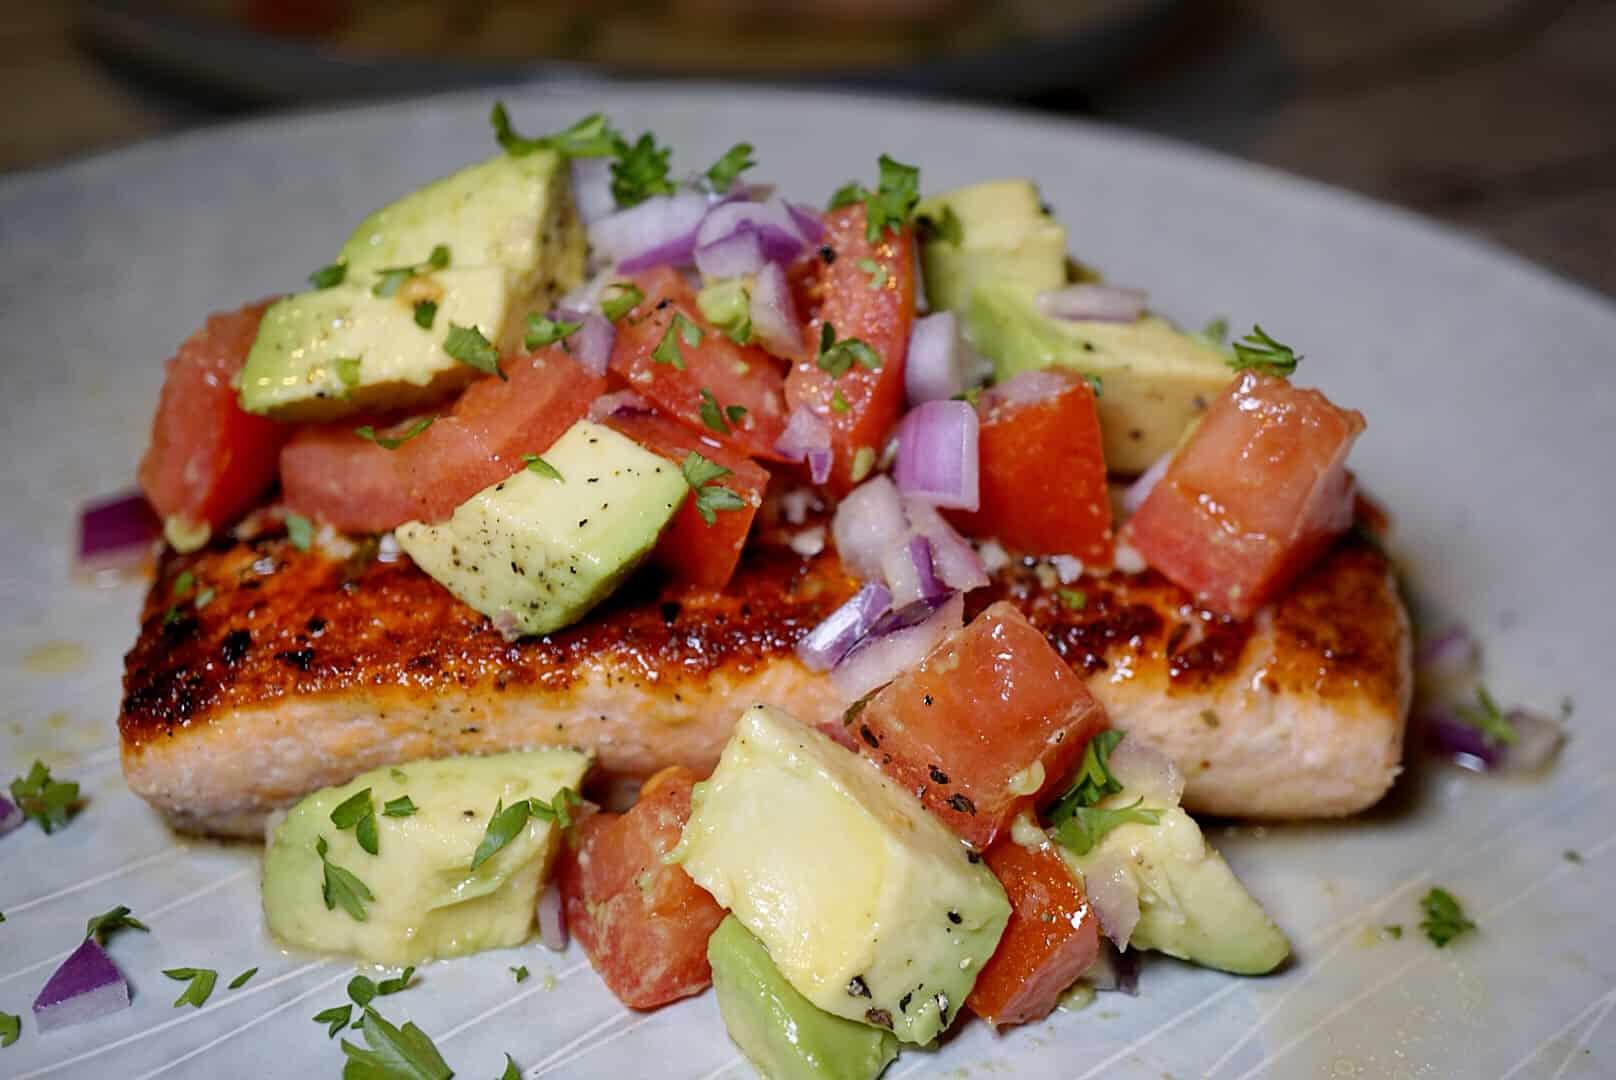 Whole30 Recipes Pan Seared Salmon With Avocado Salsa